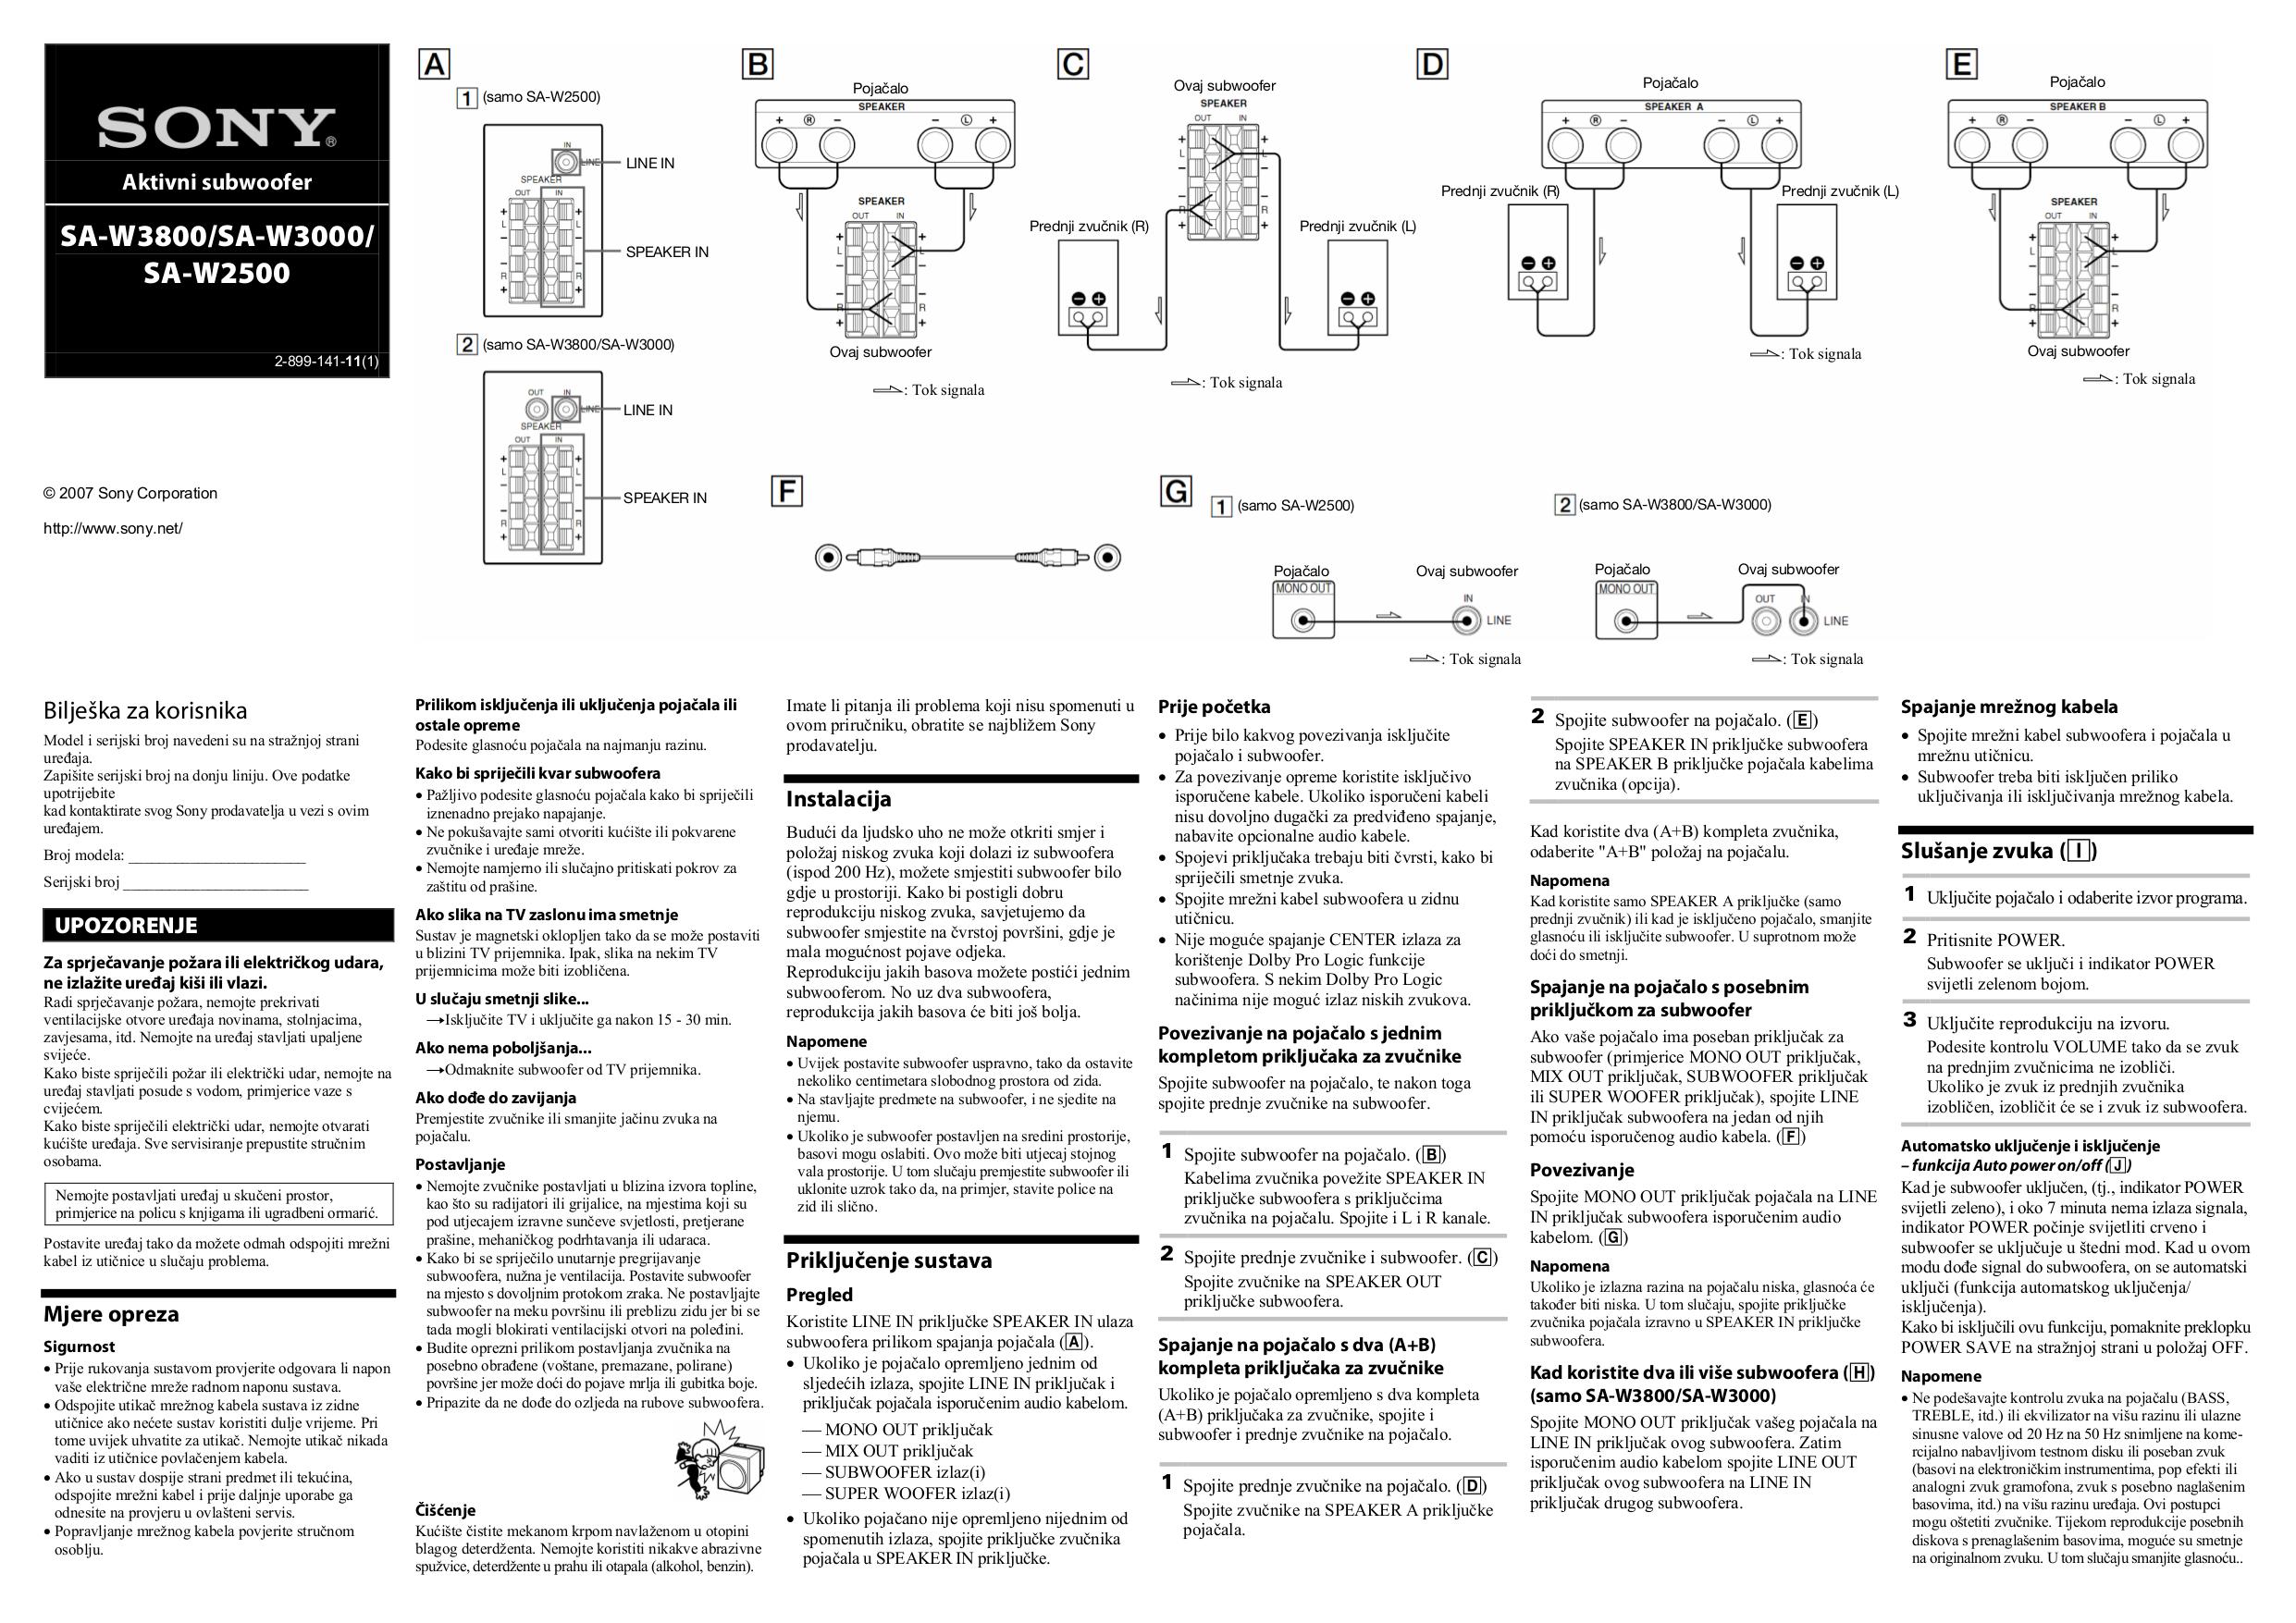 download free pdf for sony sa w3000 subwoofer manual rh umlib com Sony User Manuals sony saw2500 manual